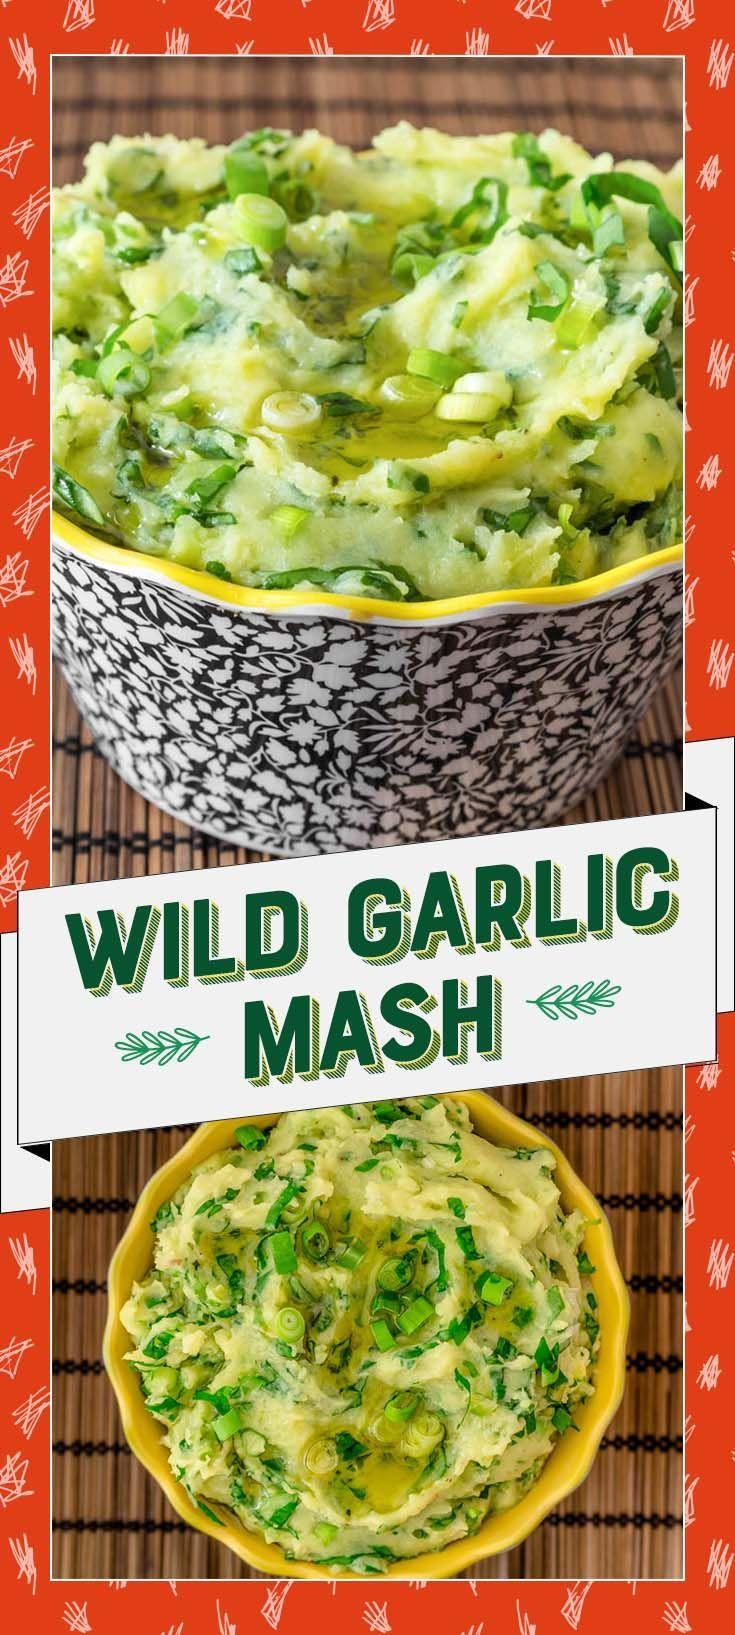 Wild Garlic Mash